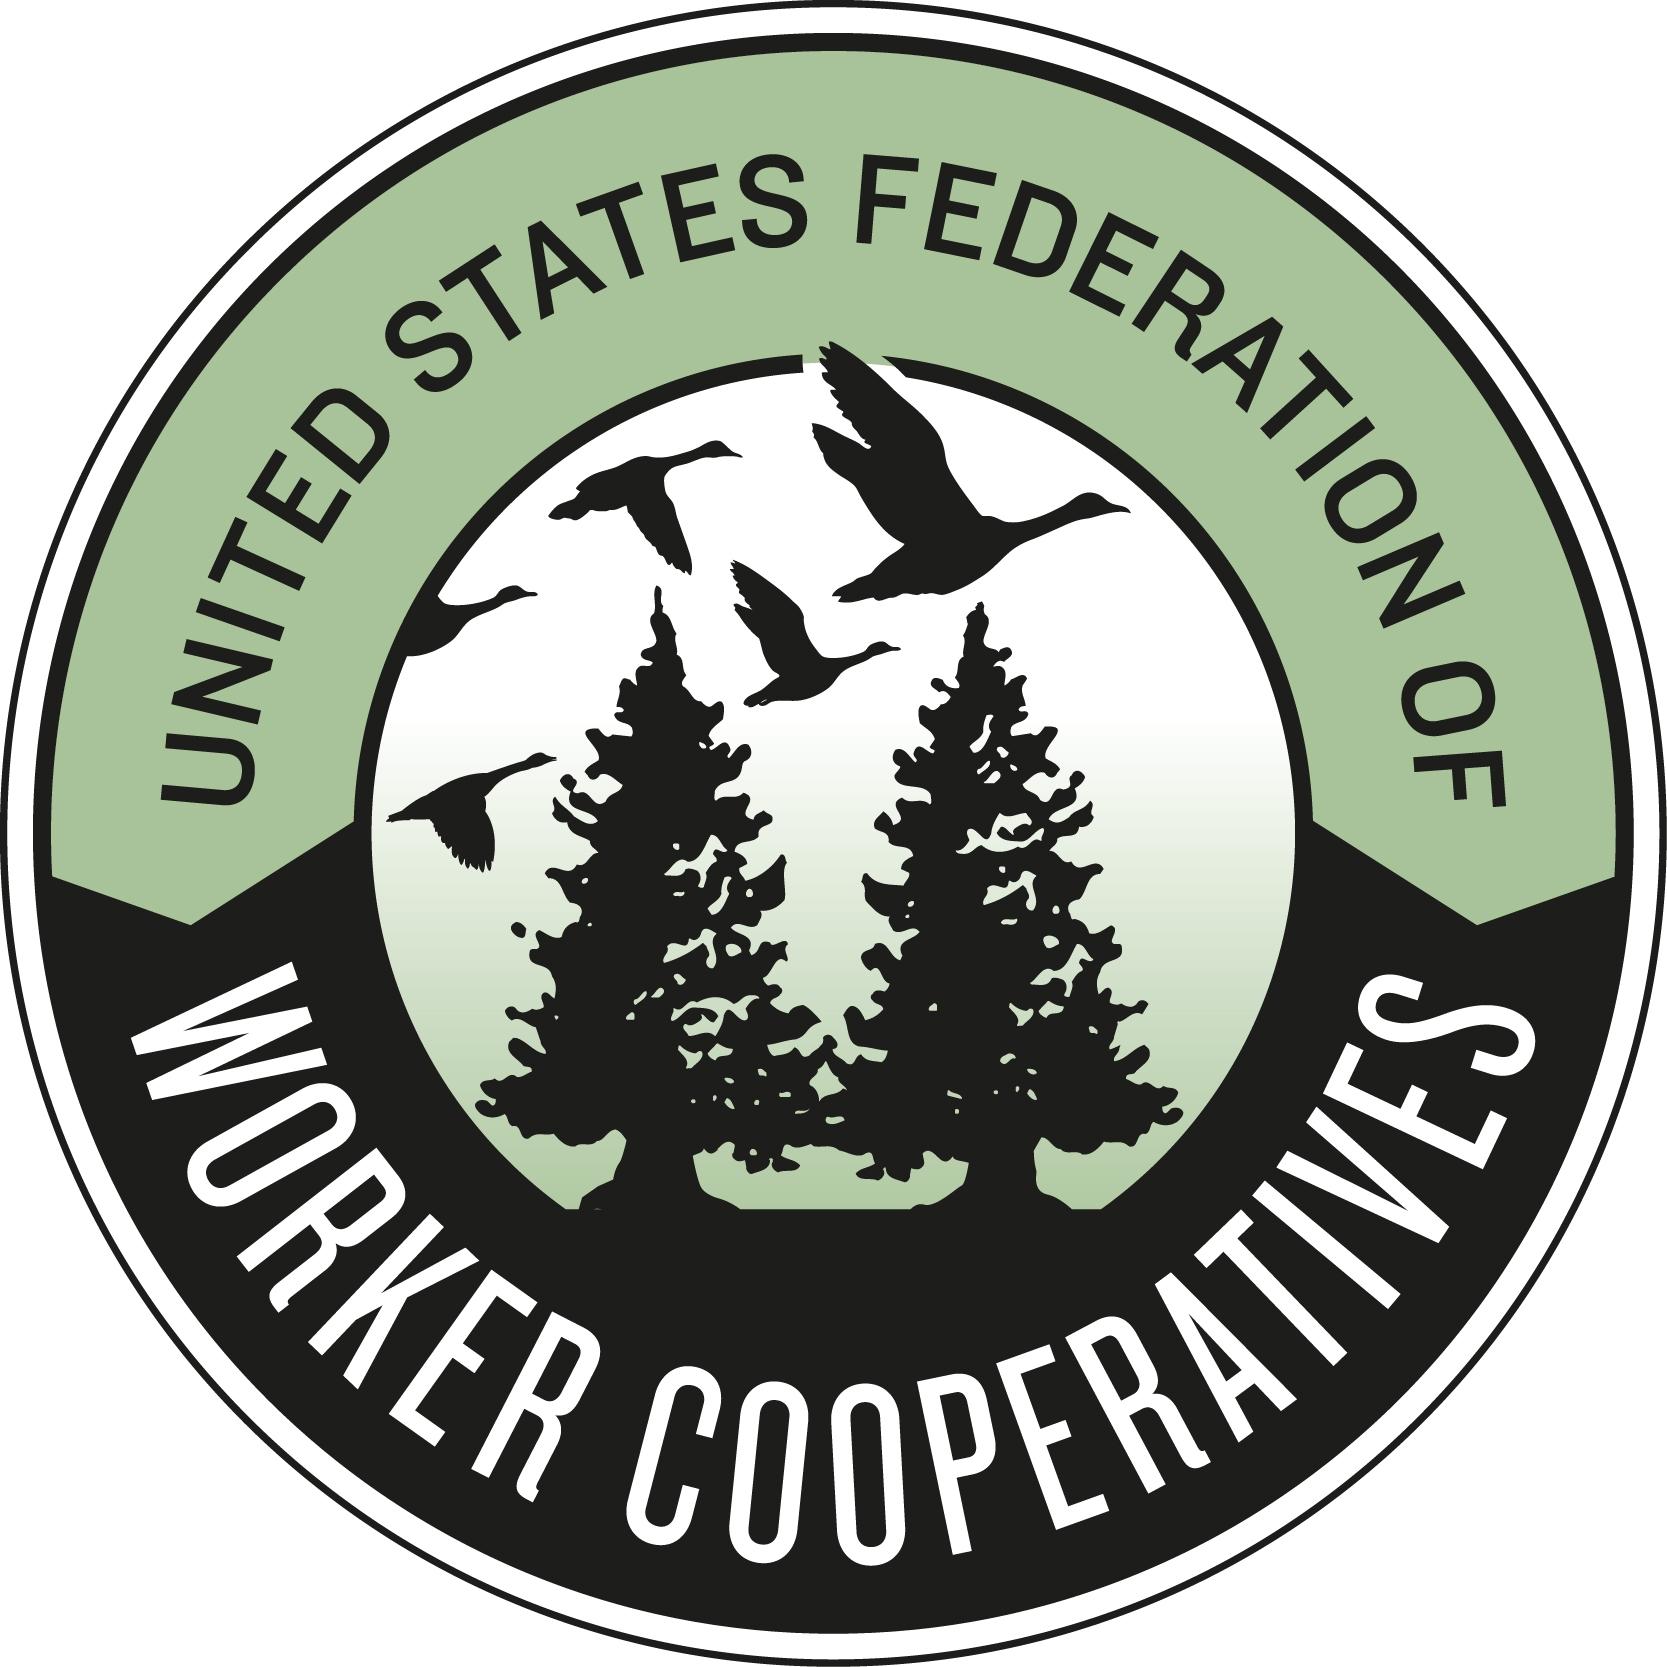 USFWC_logo_2color.jpg